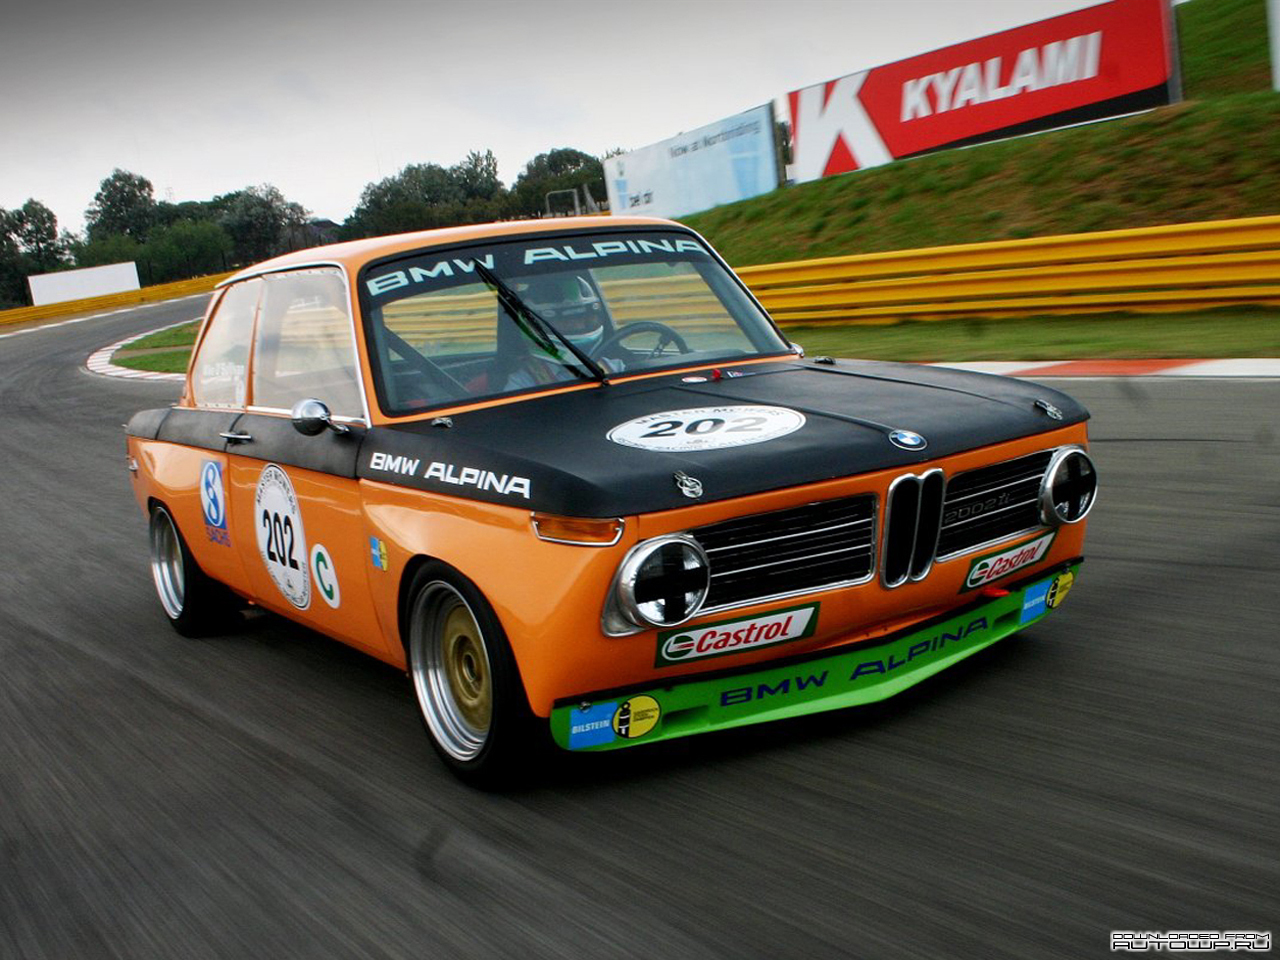 Bmw 2002 Tii Race Car >> Alpina 2002tii Race Car (E10) photos - PhotoGallery with 2 ...